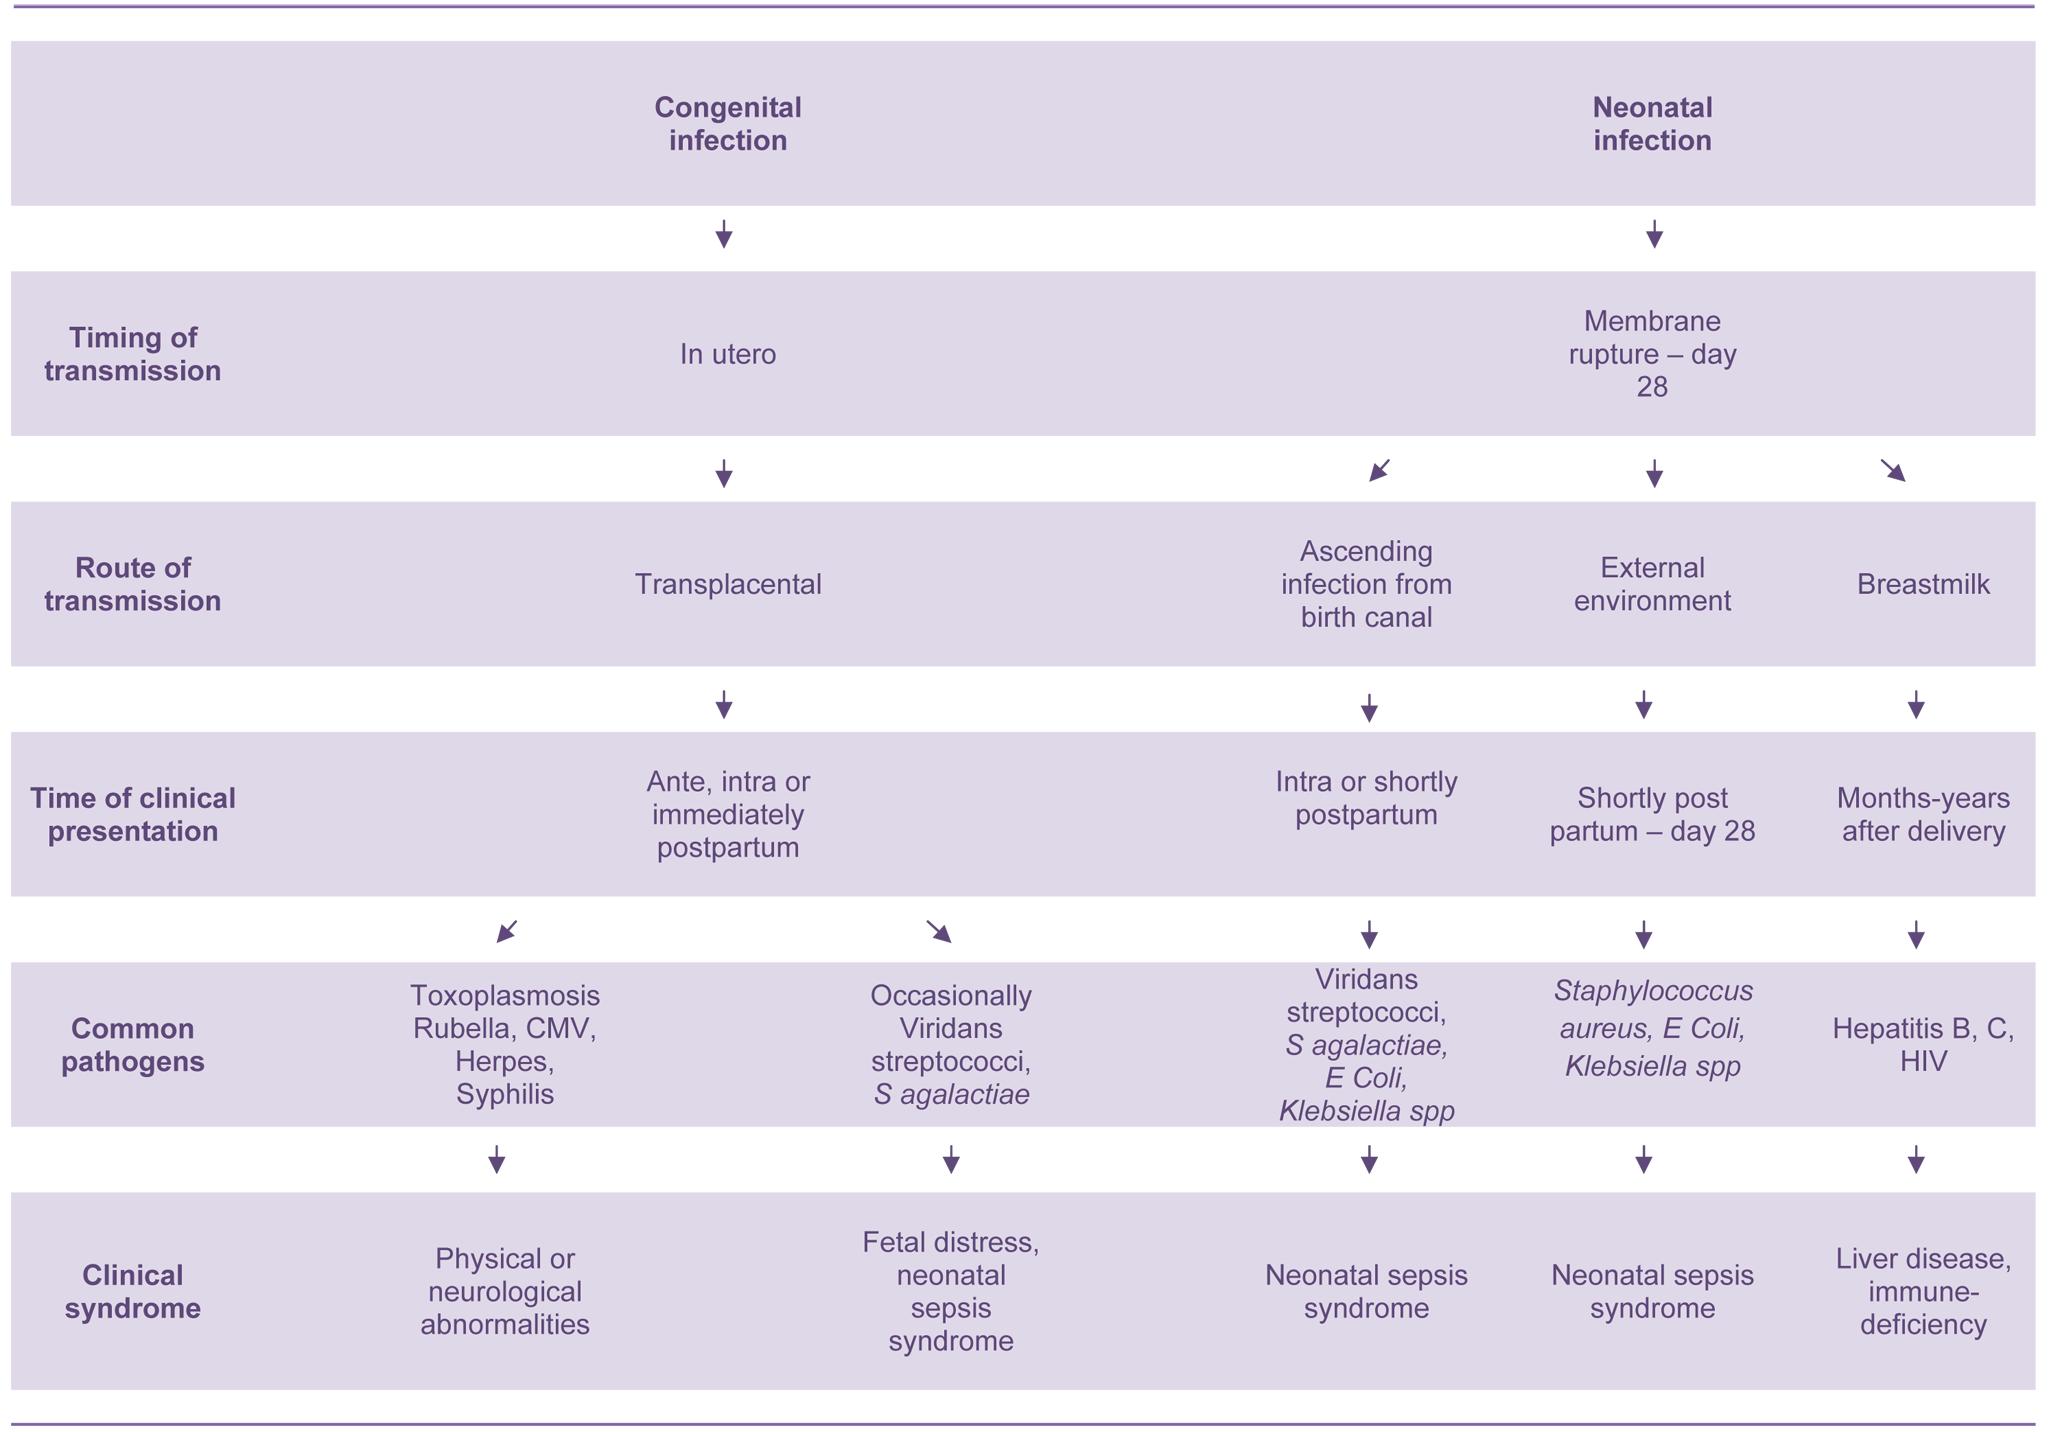 Pathogenesis of congenital and neonatal infections.